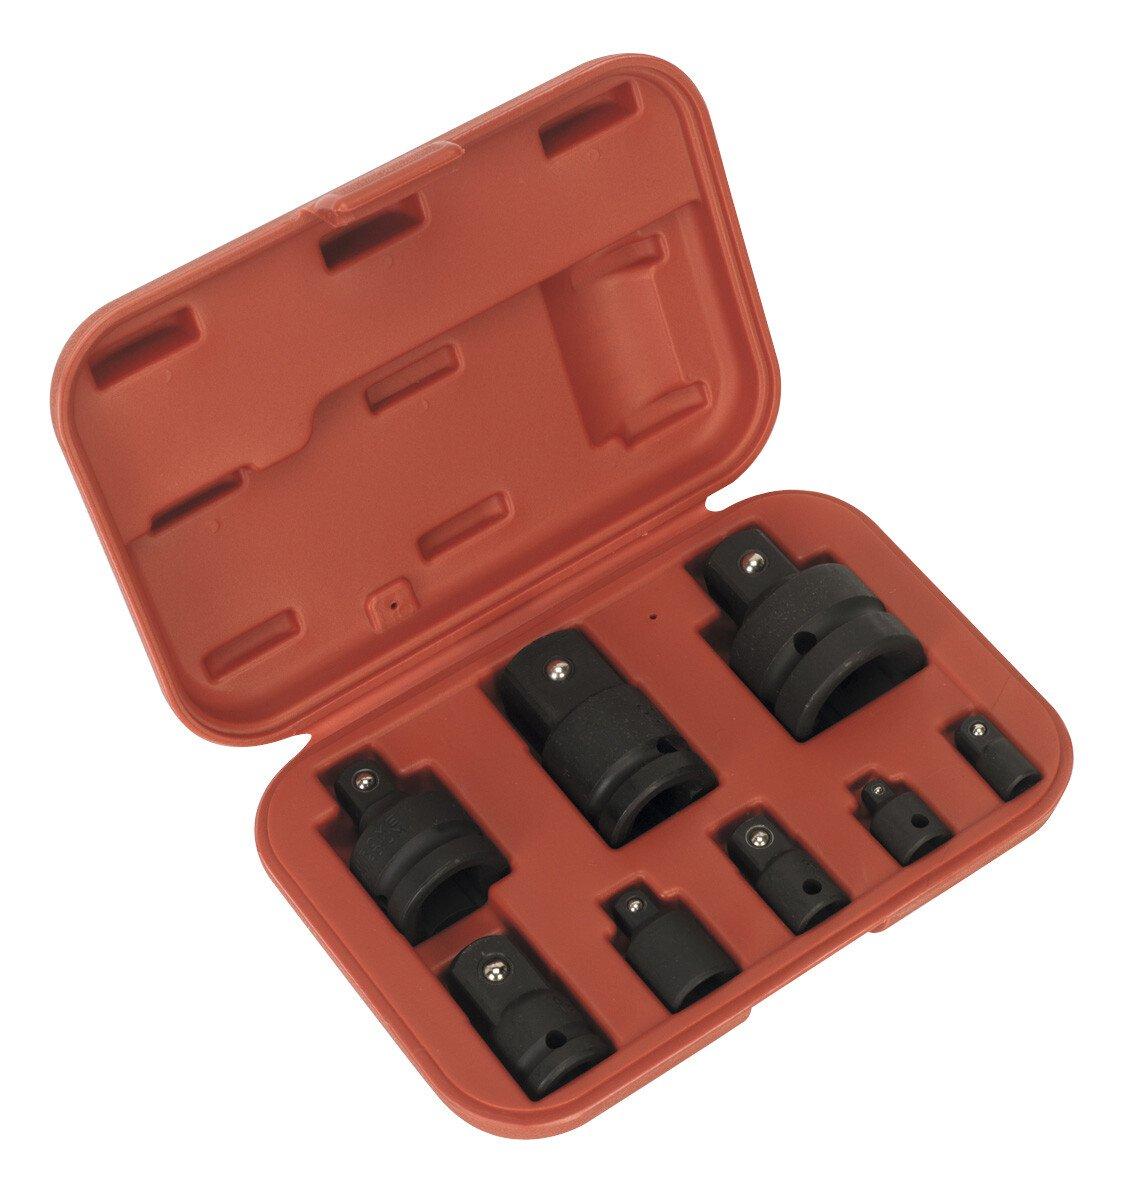 Sealey AK5900B Impact Socket Adaptor Set in Storage Case 8 Piece